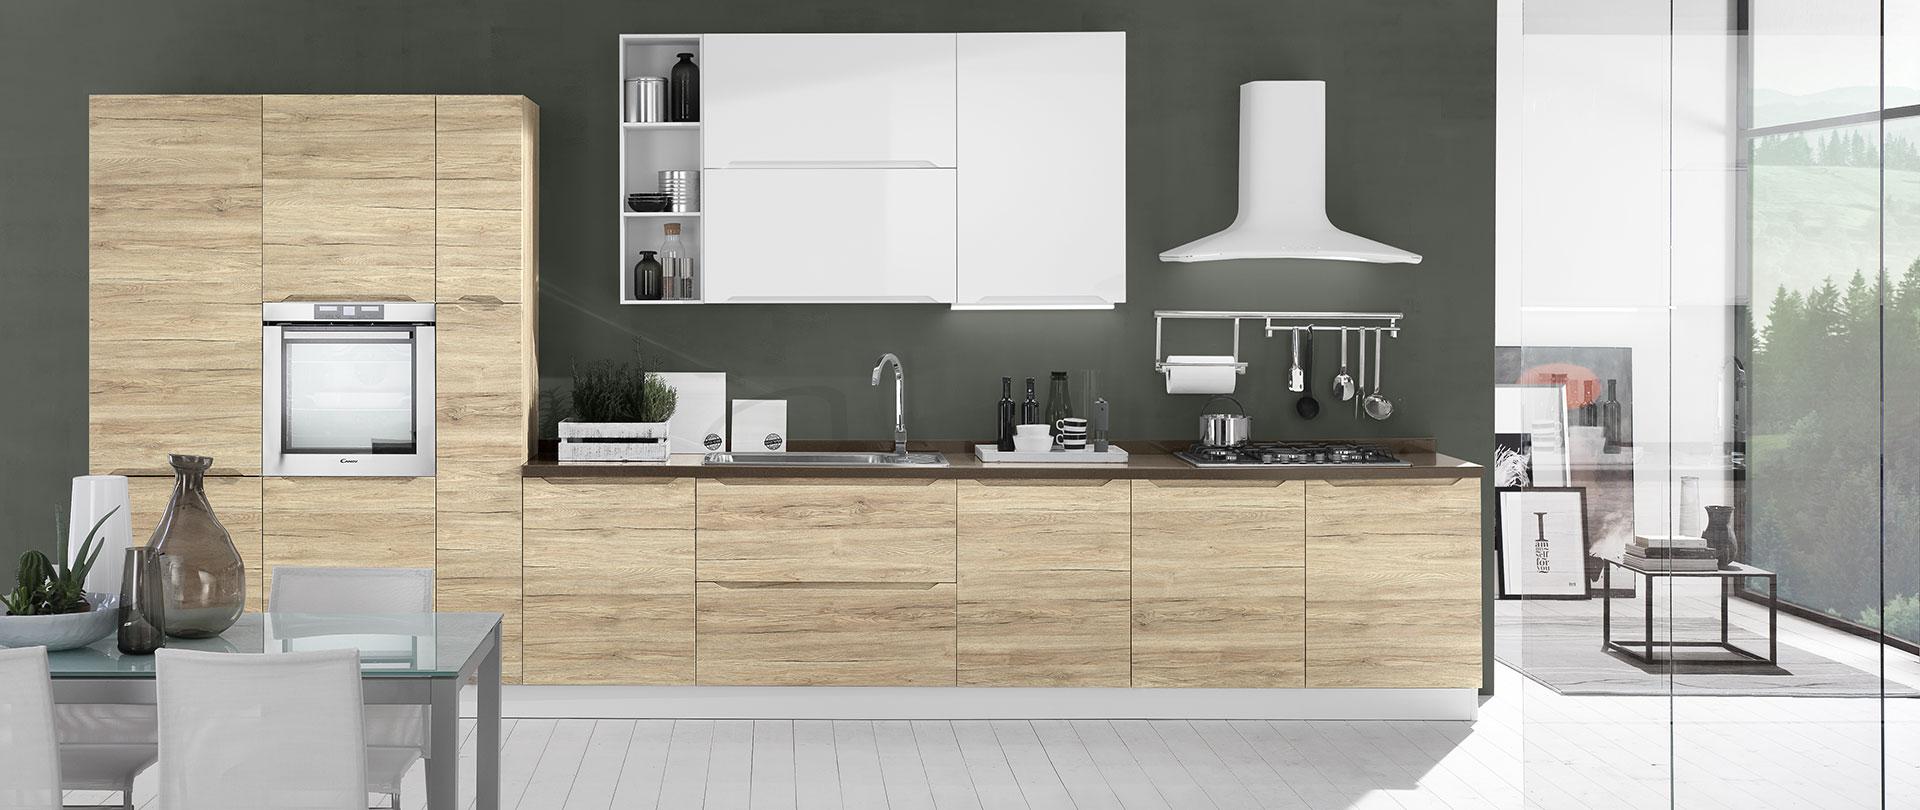 Cucine con maniglie integrate carima evo cucine - Cucina rovere bianco ...